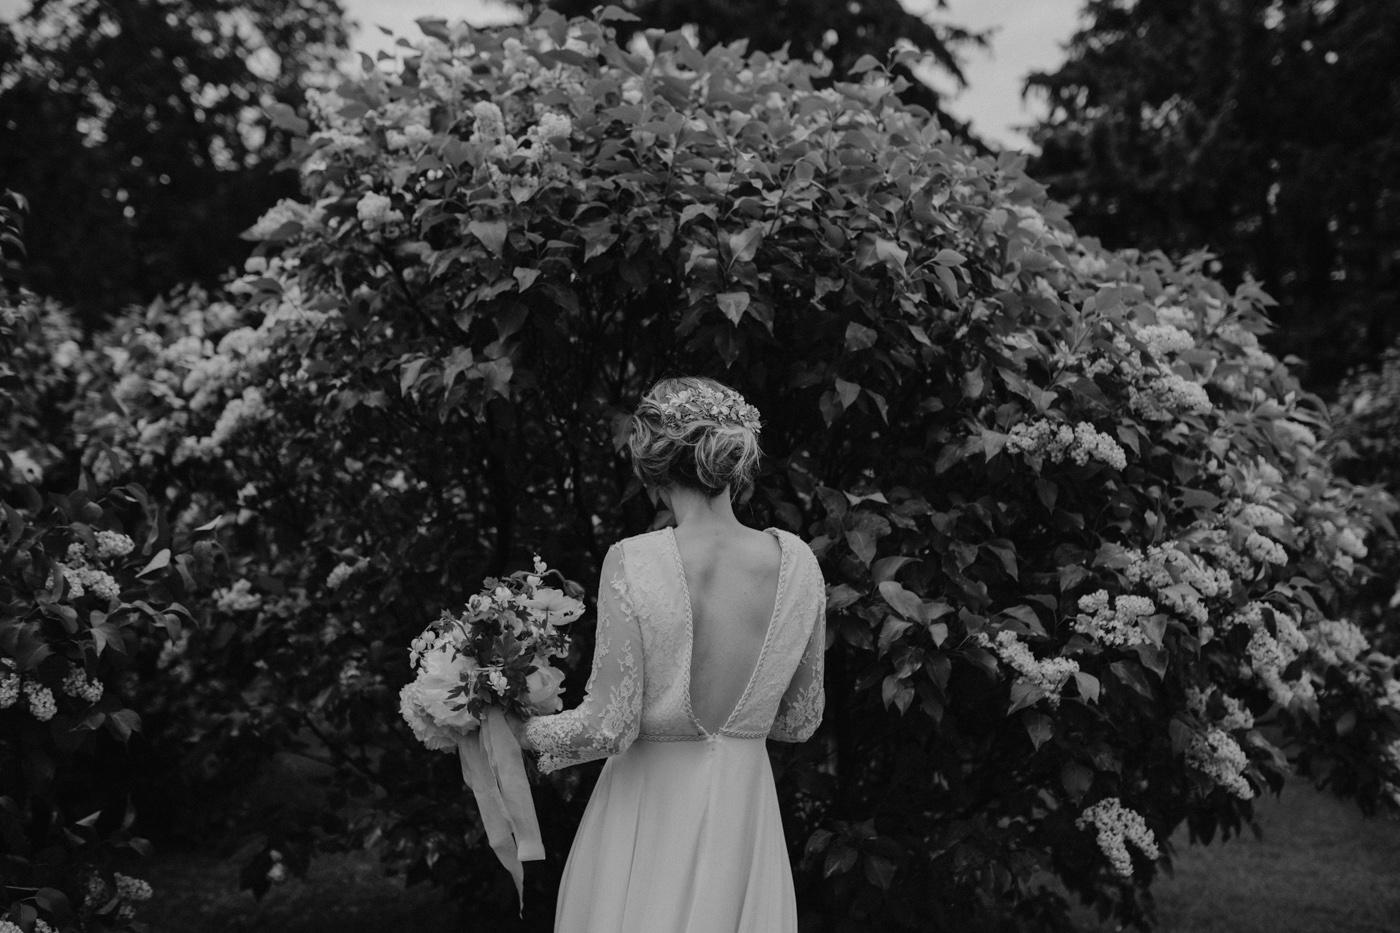 Erin-Mike-Intimate-Vintage-Wedding-Shelburne-Farms-Vermont -115.jpg